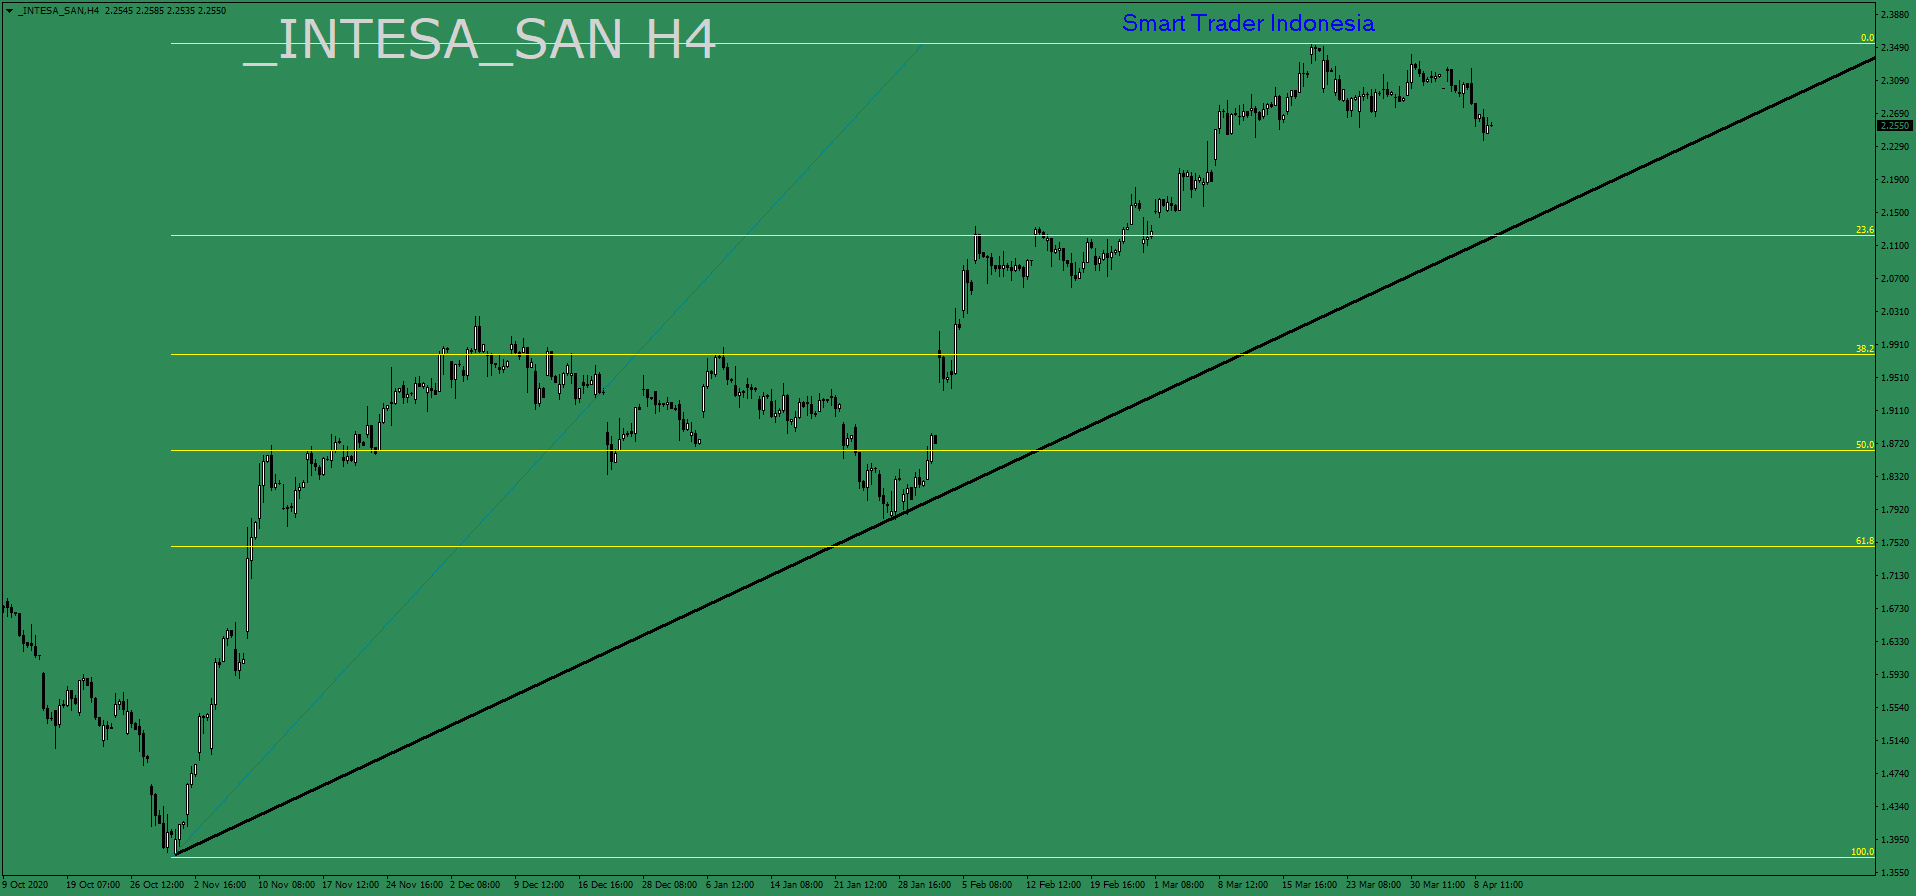 intesa-san-h4-ava-trade-ltd-2.png